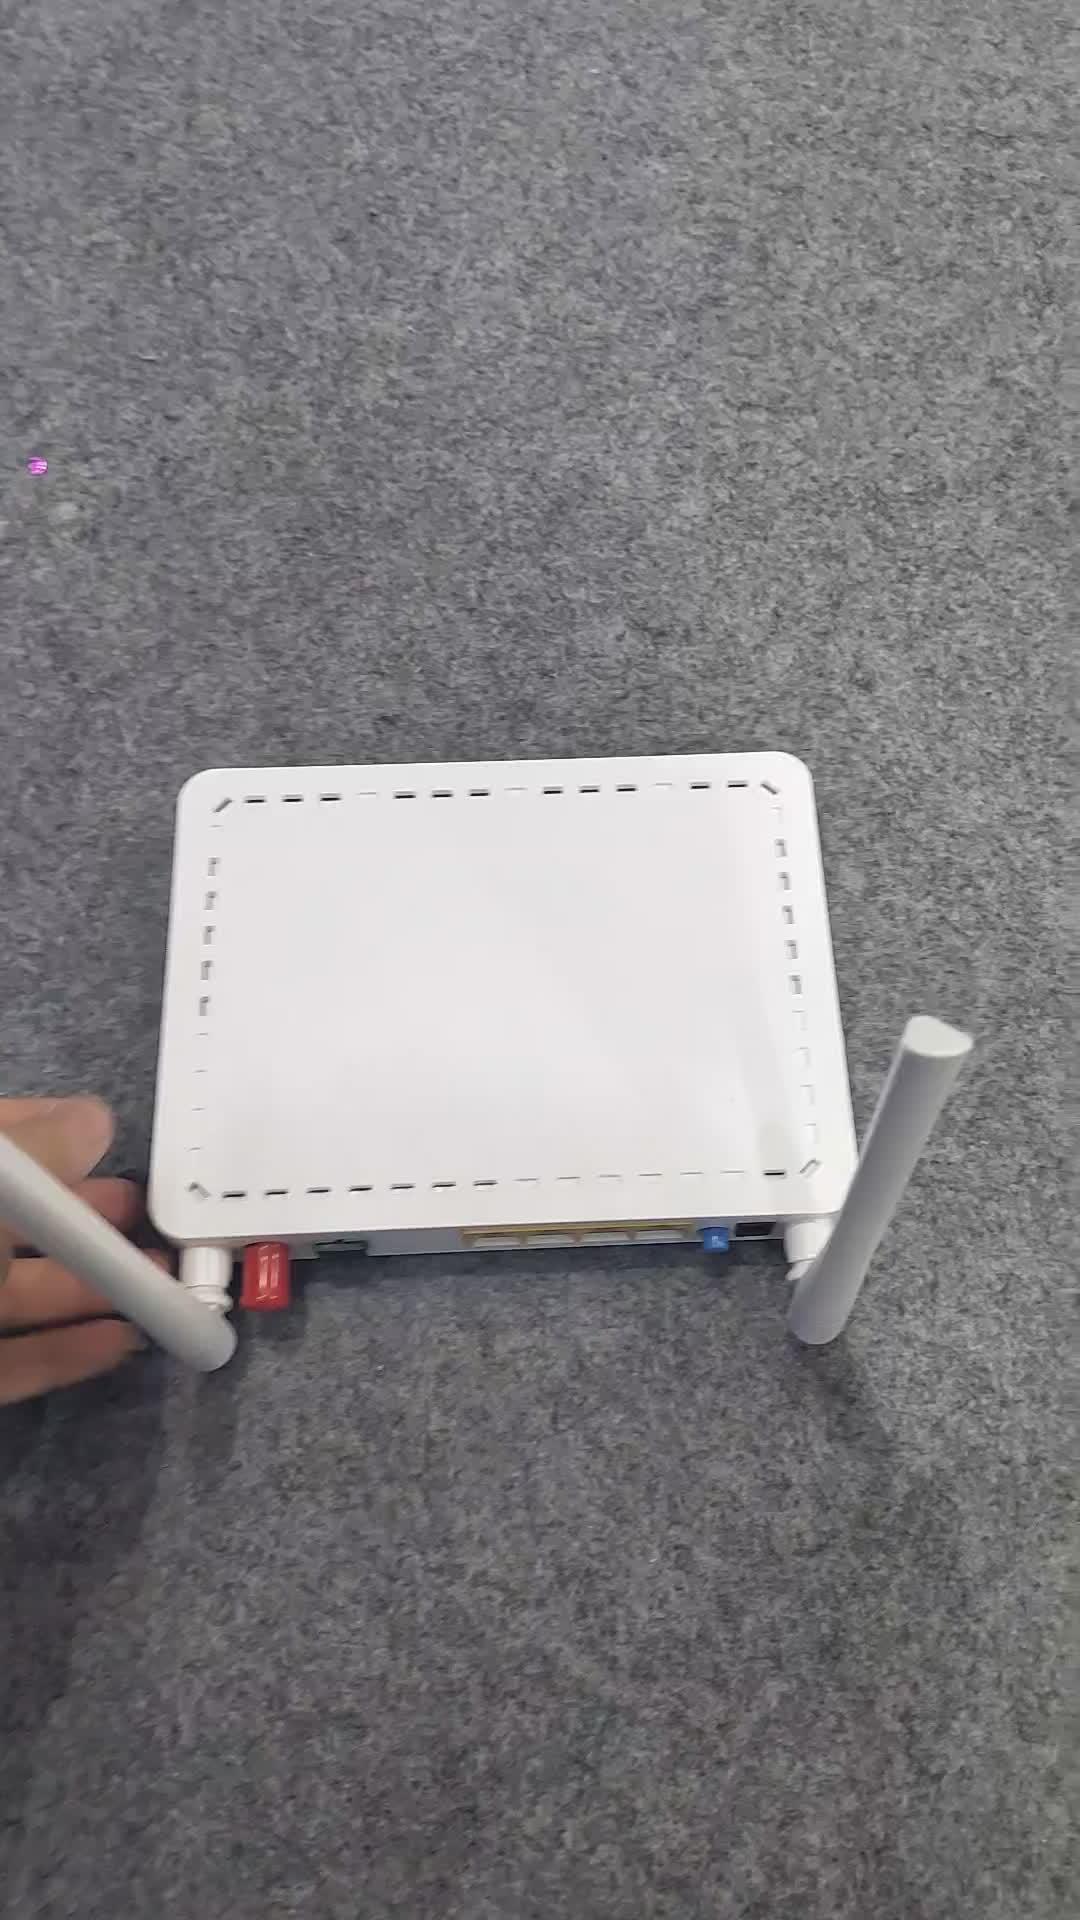 The newest 1ge wifi gepon onu zte port + 2 antennal 300m epon device 1fe+wifi